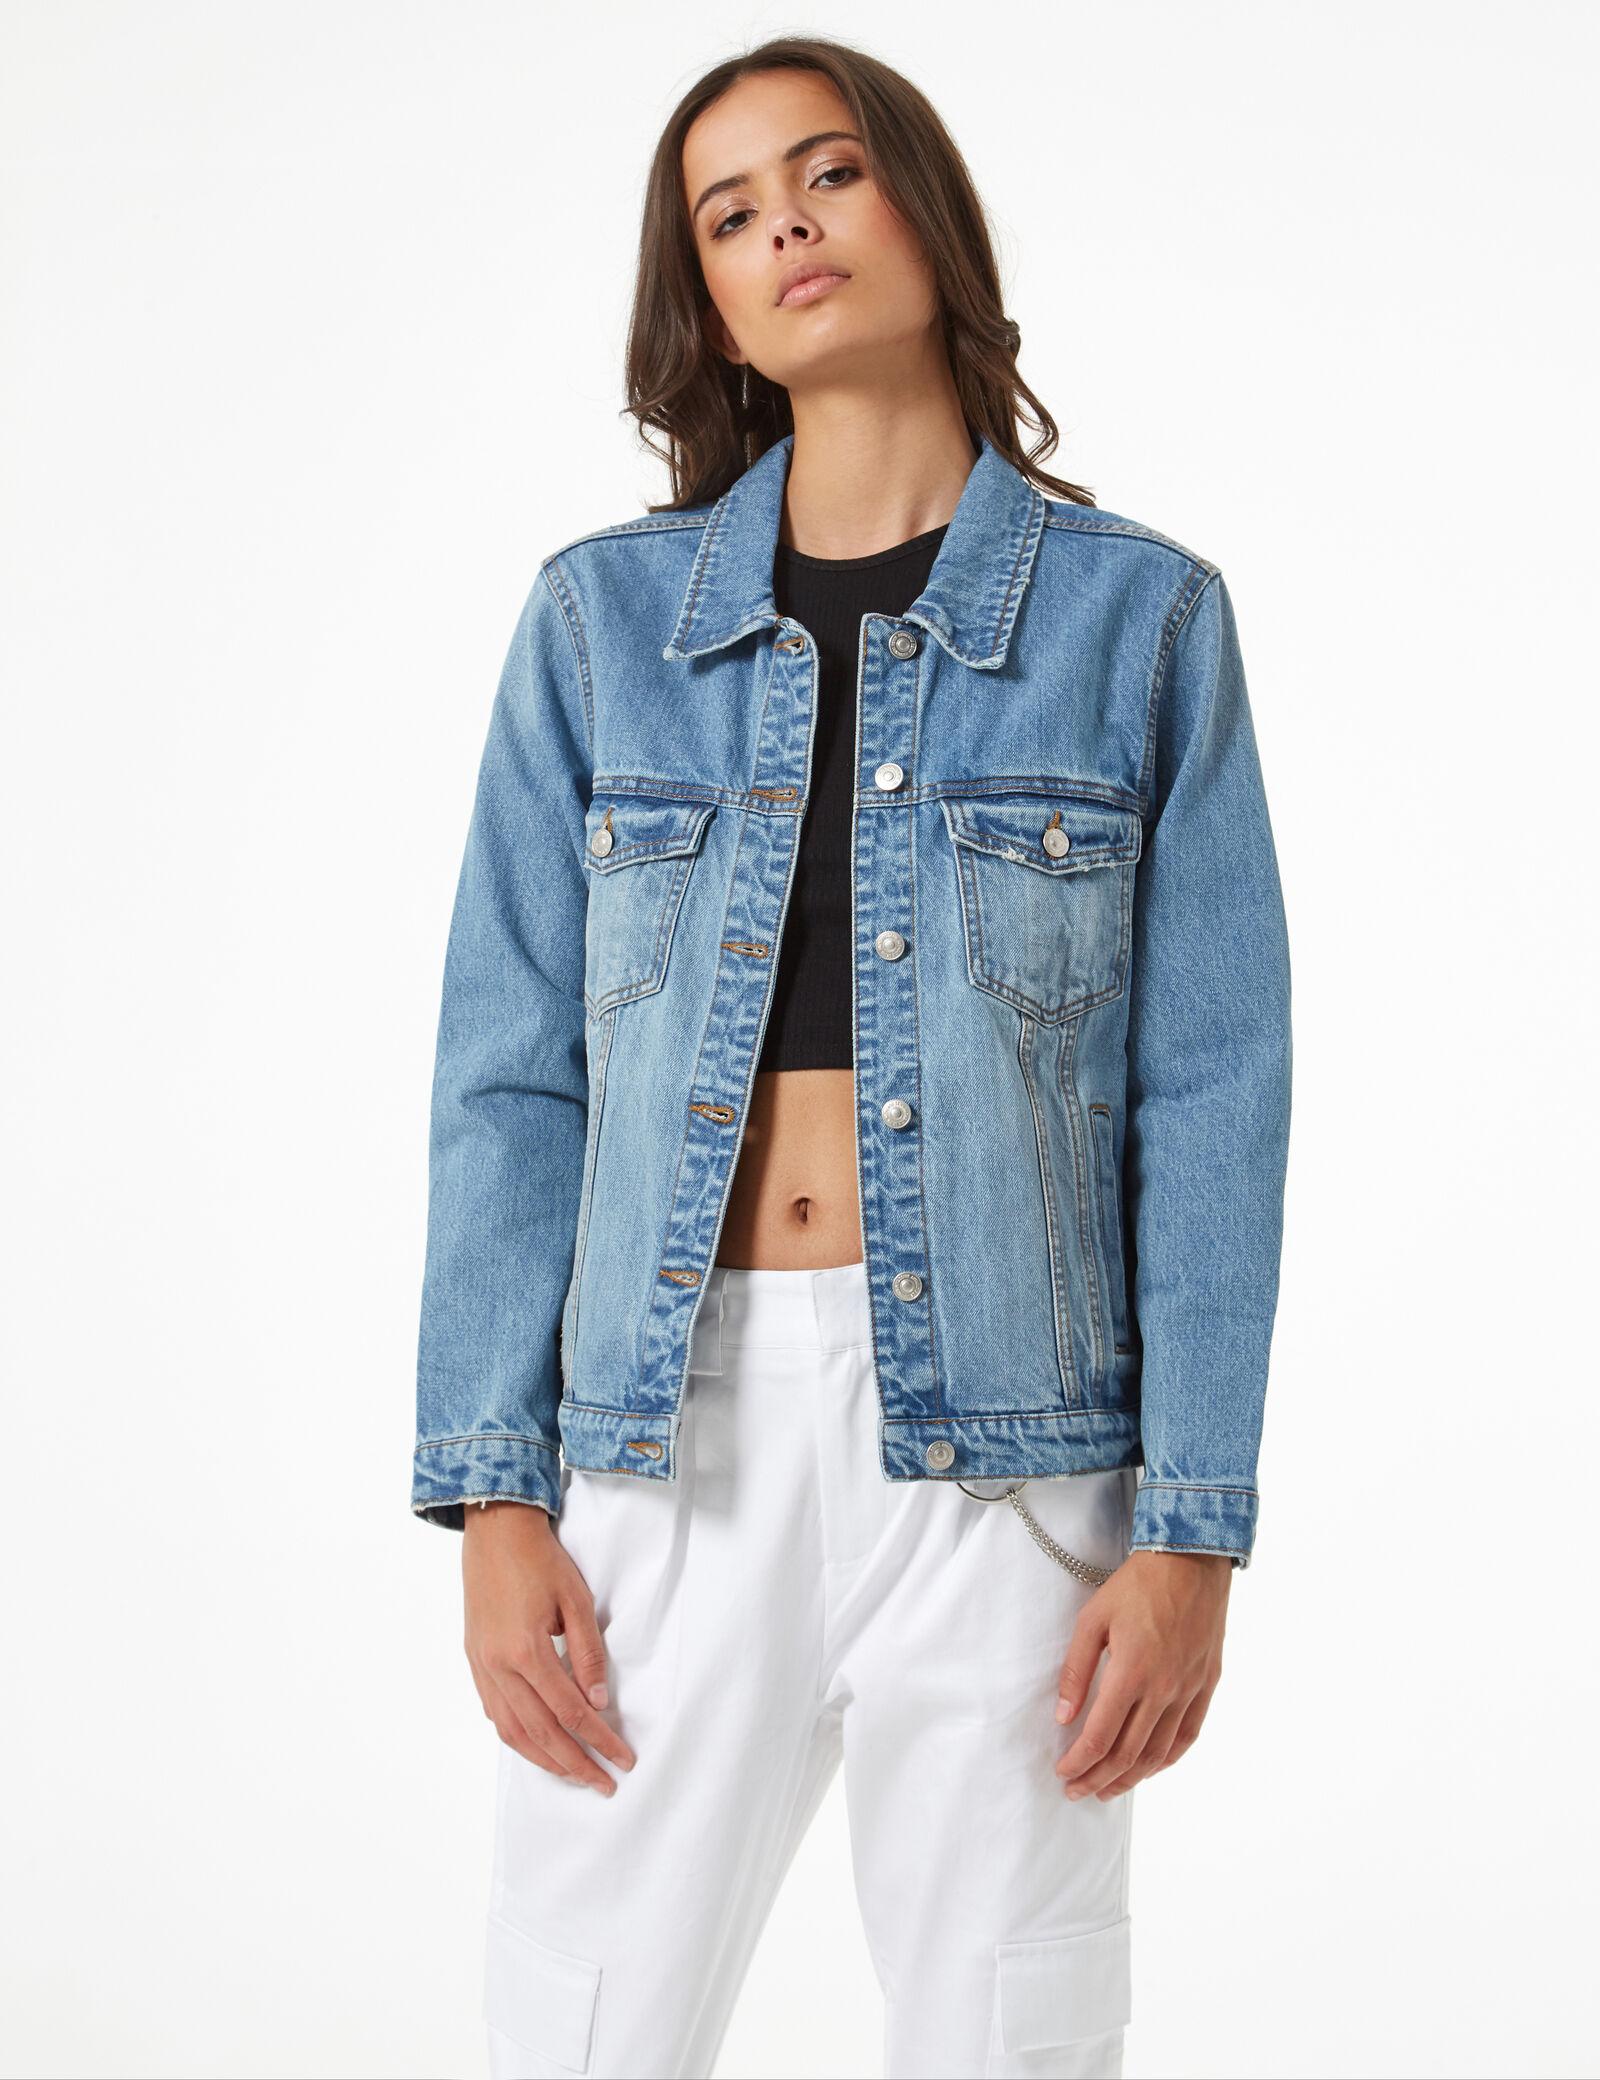 veste en jeans femme 2019